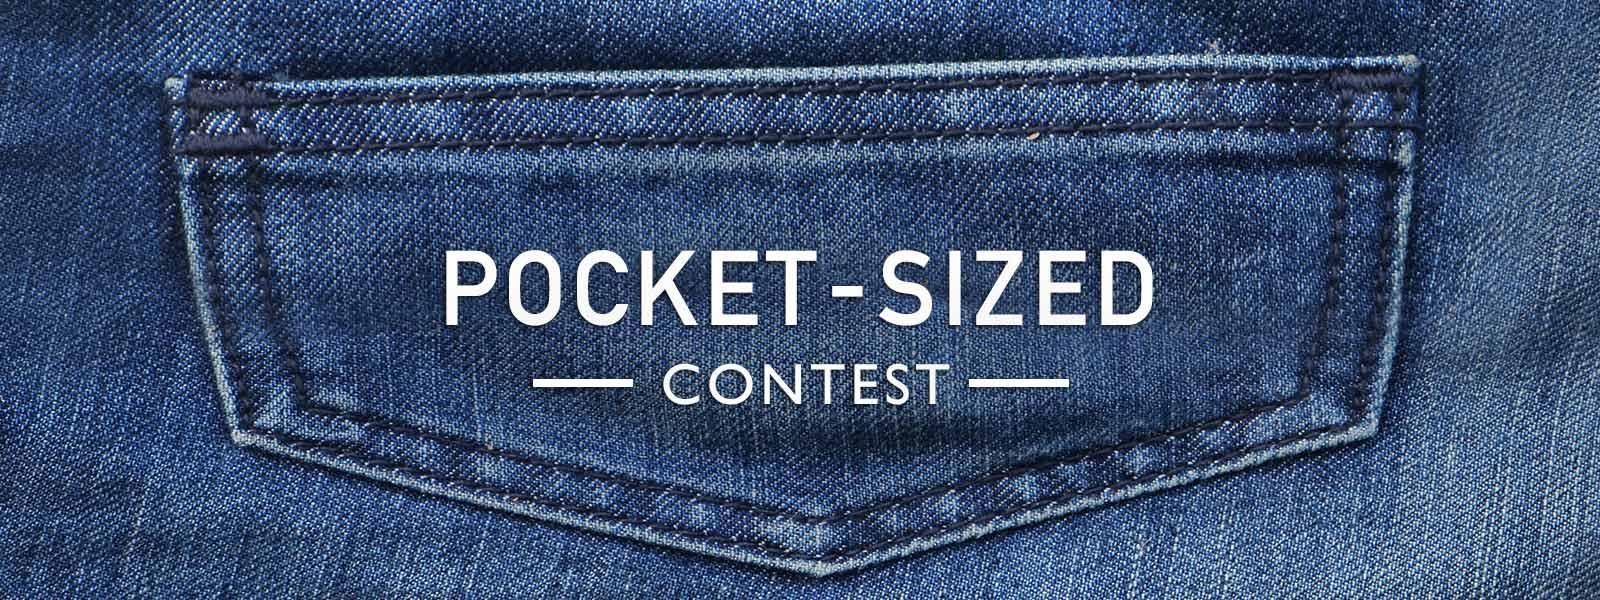 Pocket Sized Contest